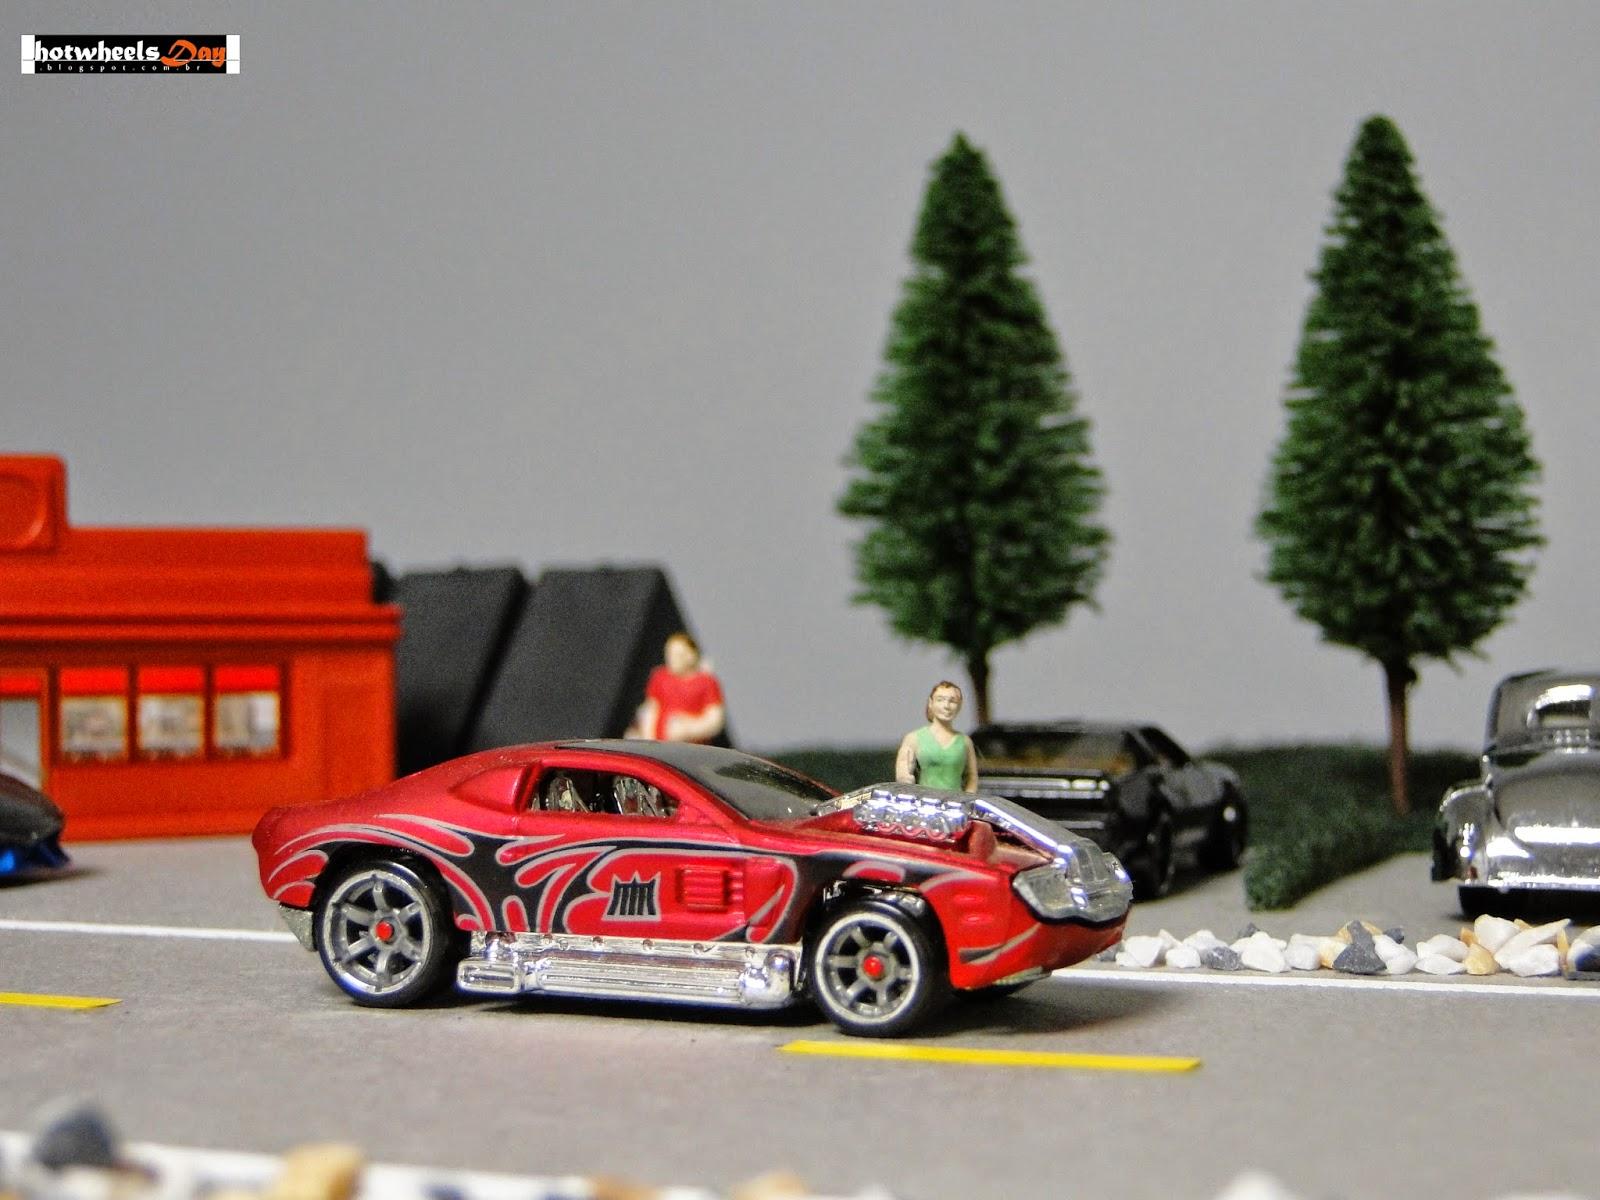 hotwheels day hollowback acceleracers 2006